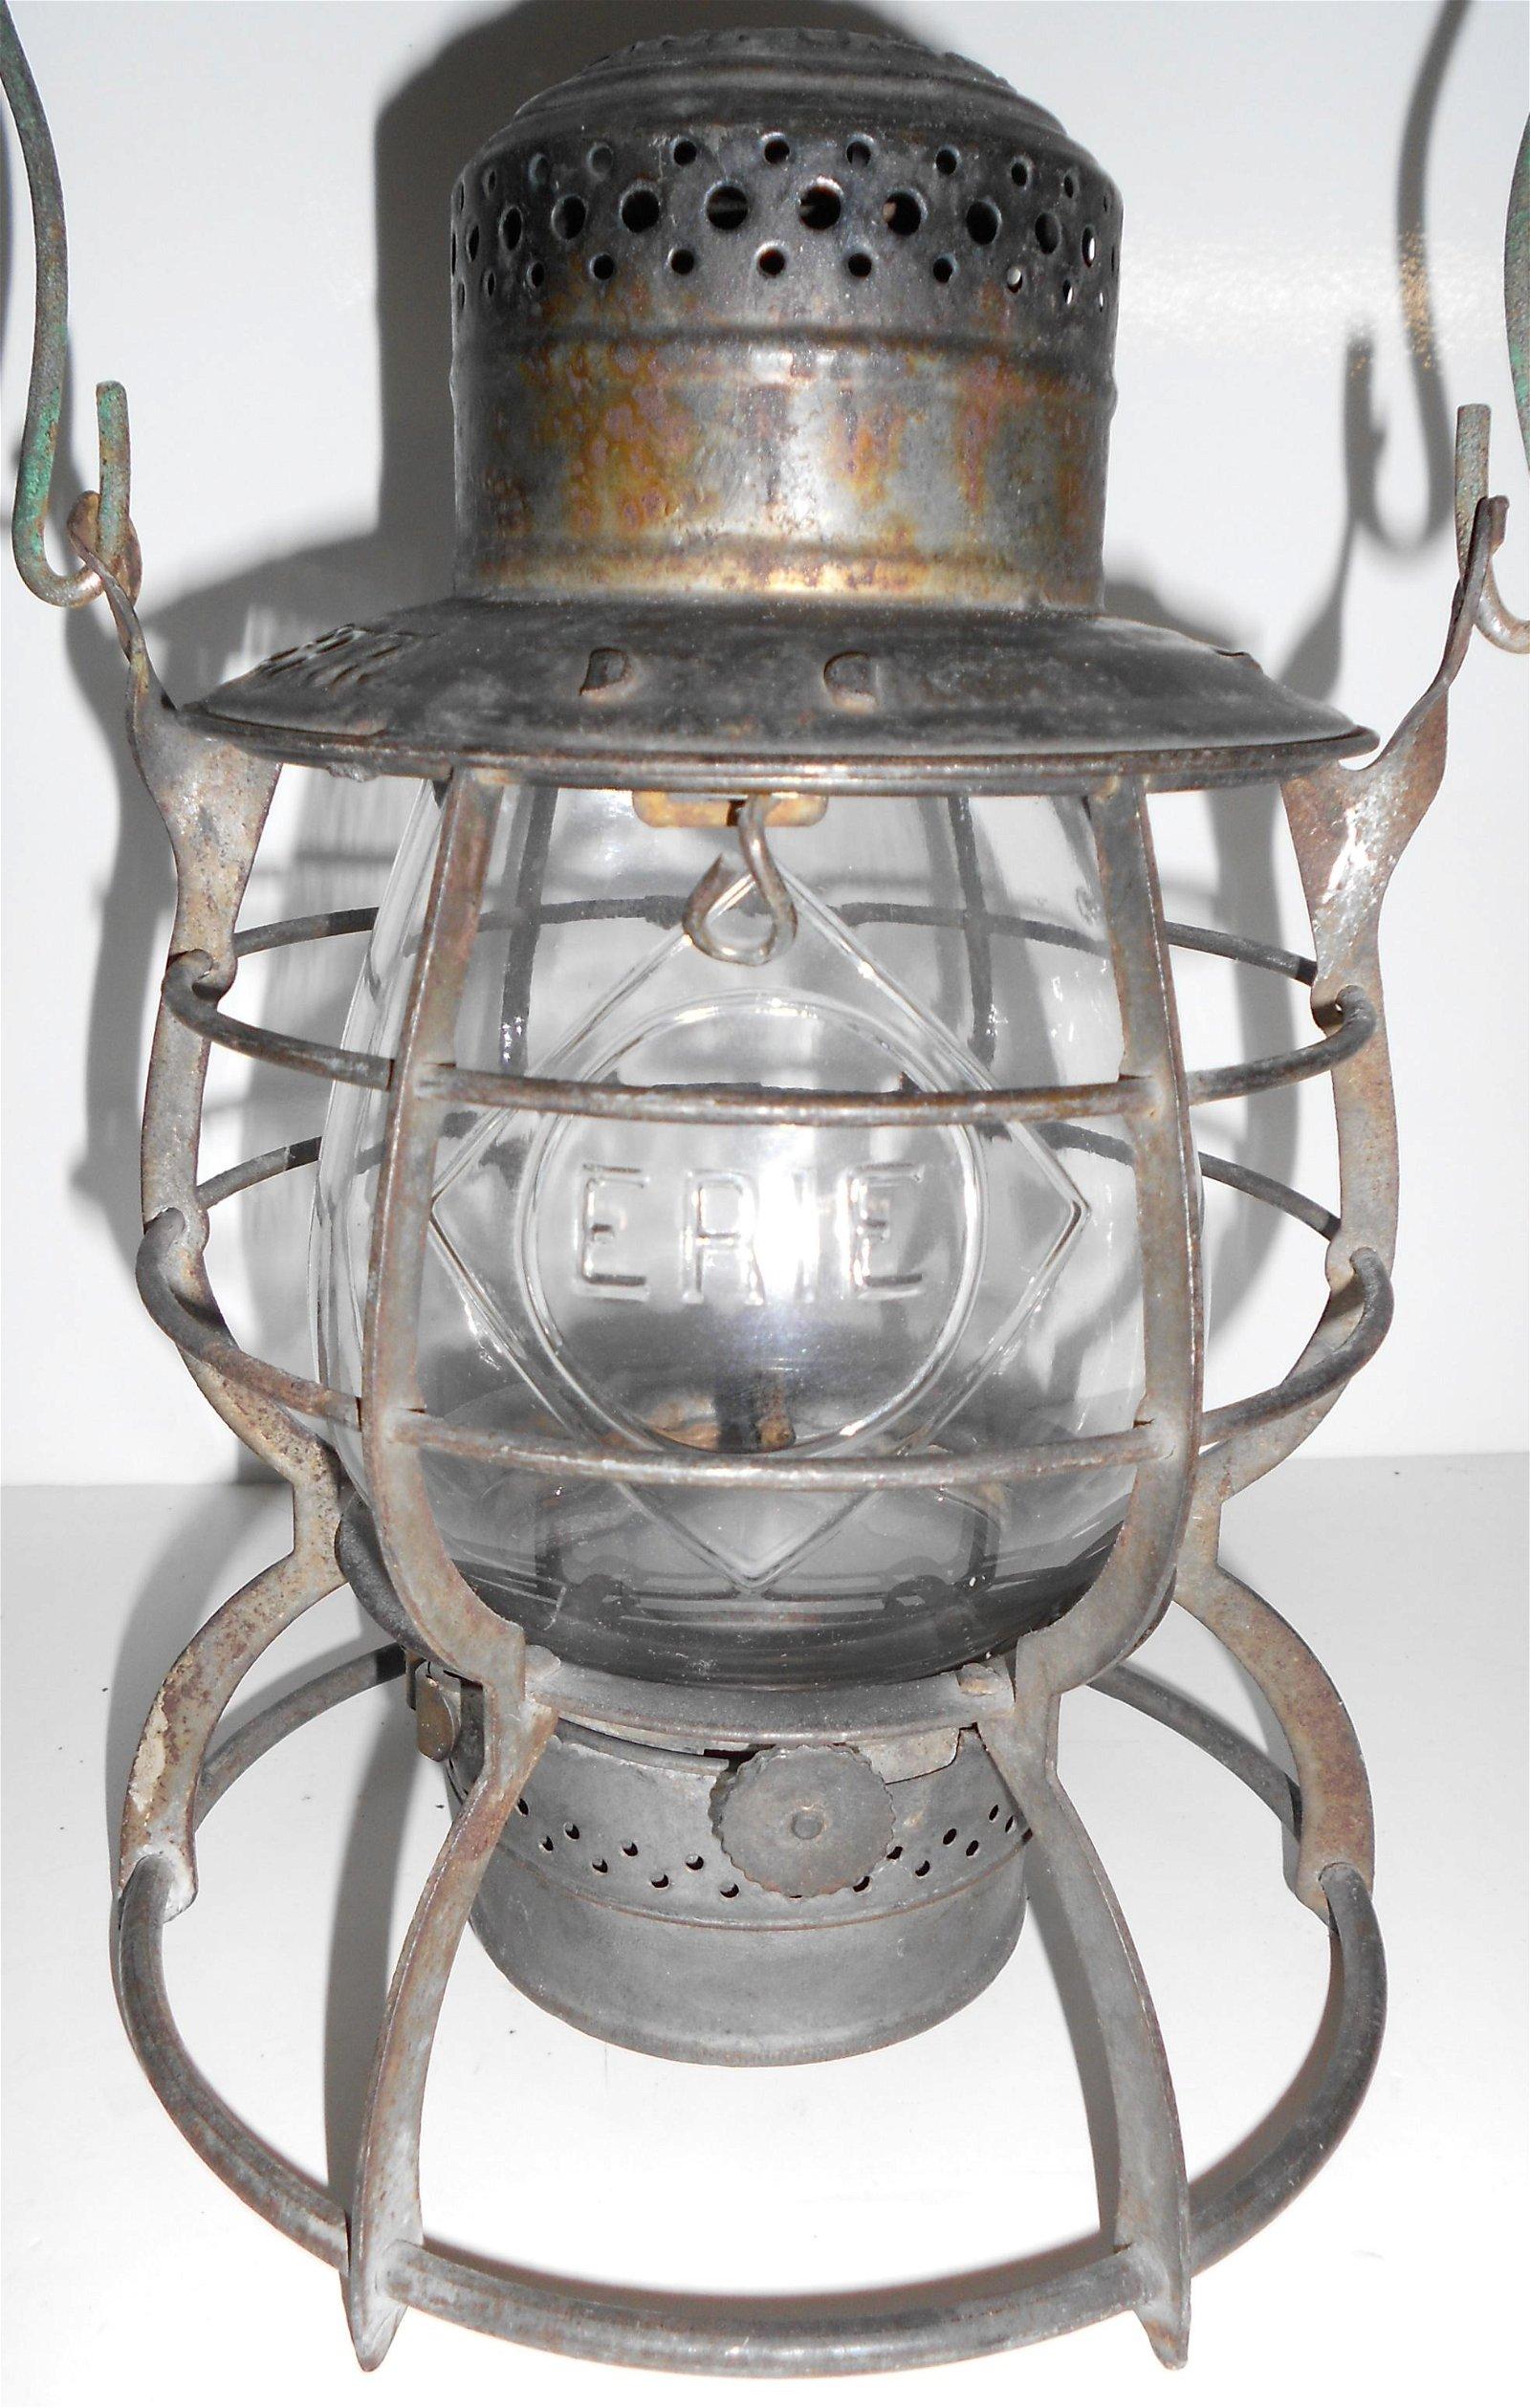 Erie Railroad Lantern Cast DIAMOND Globe